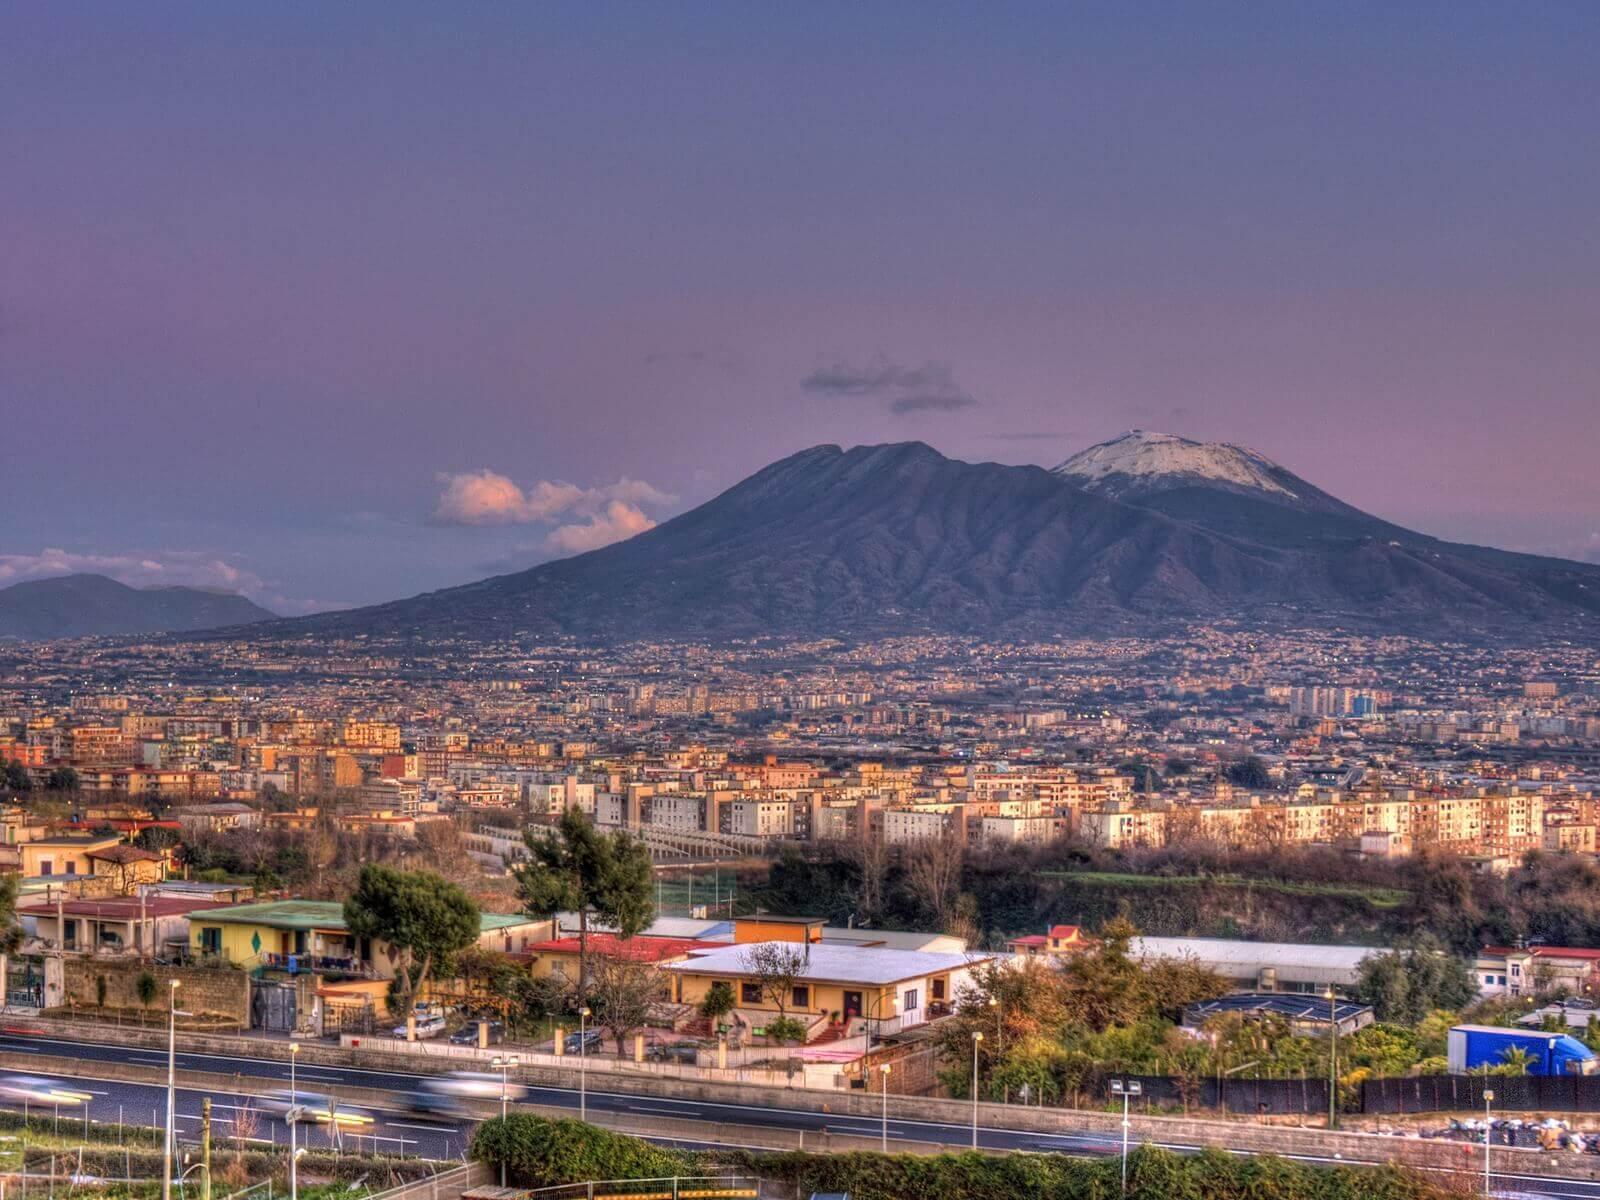 Mount_Vesuvius_in_Naples_Italy_Napoli1